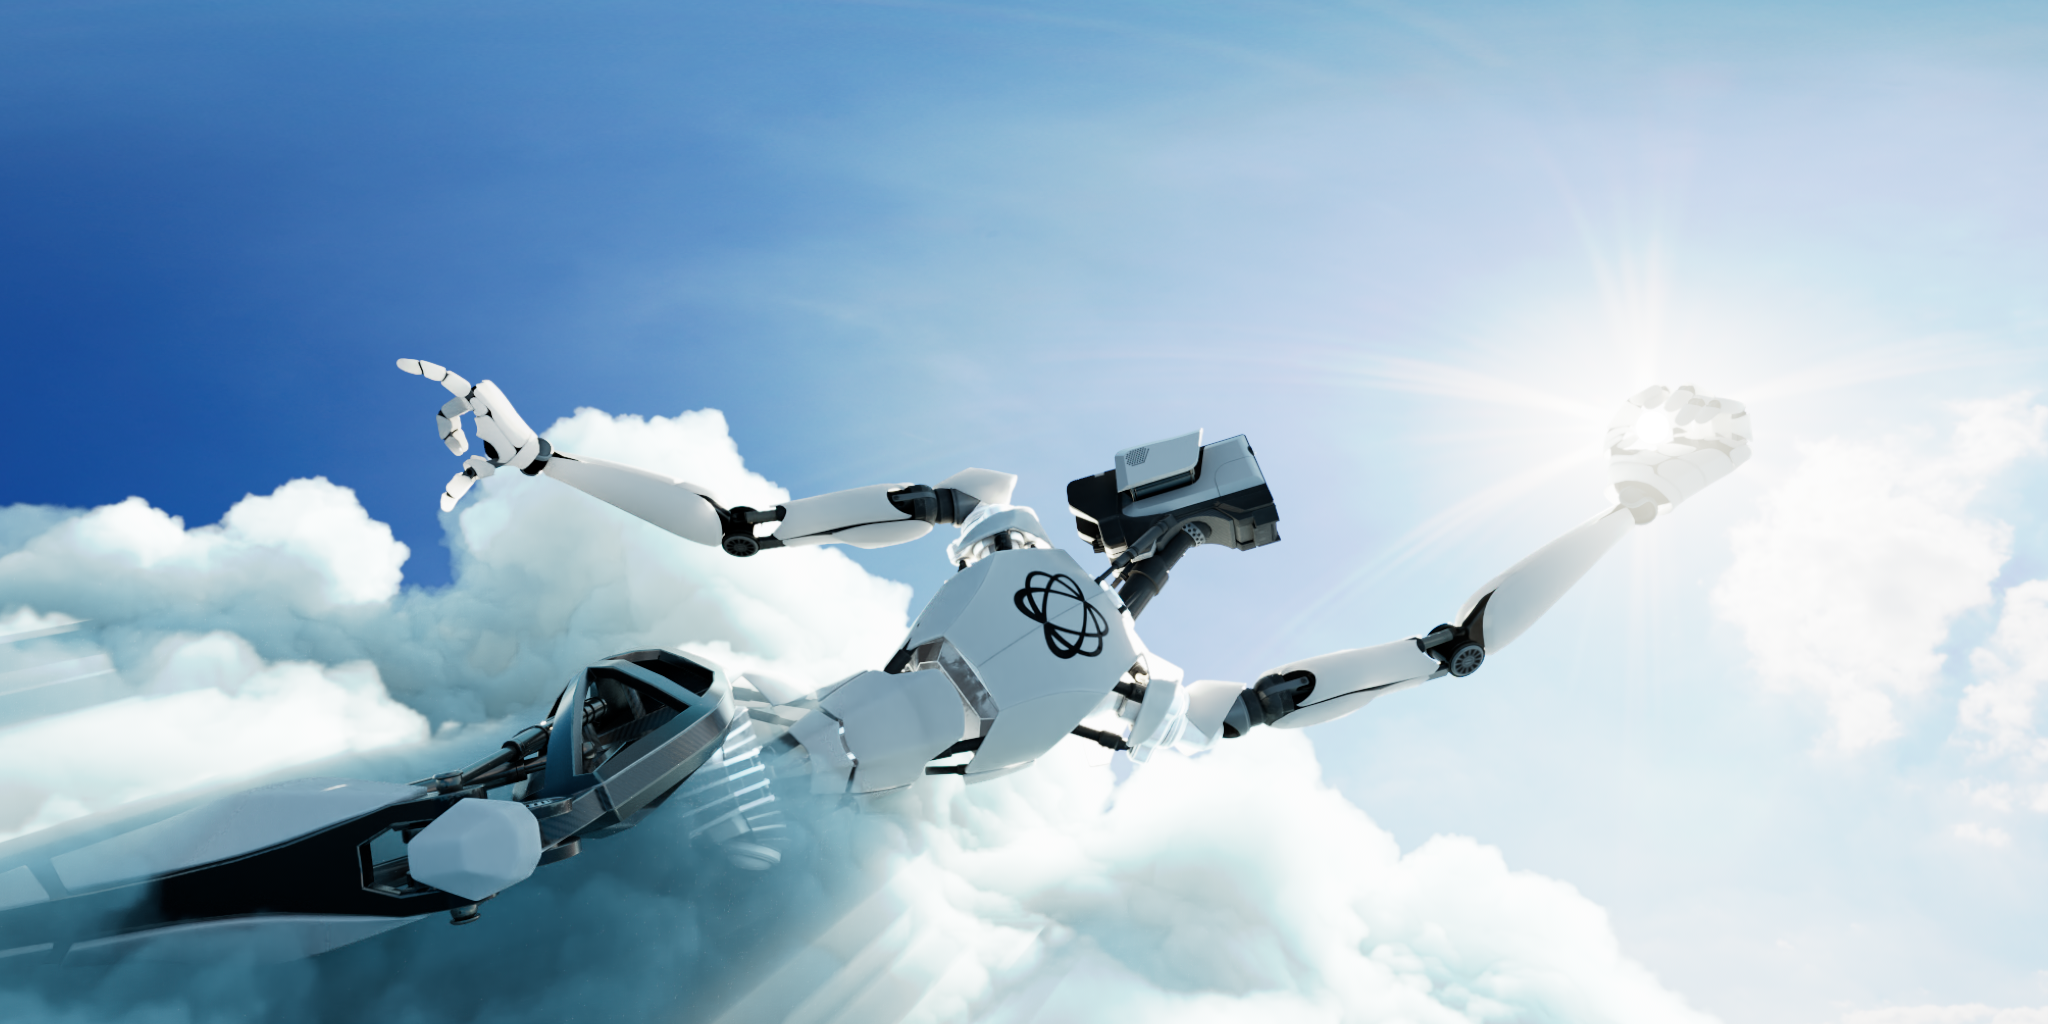 Pix Live Cloud